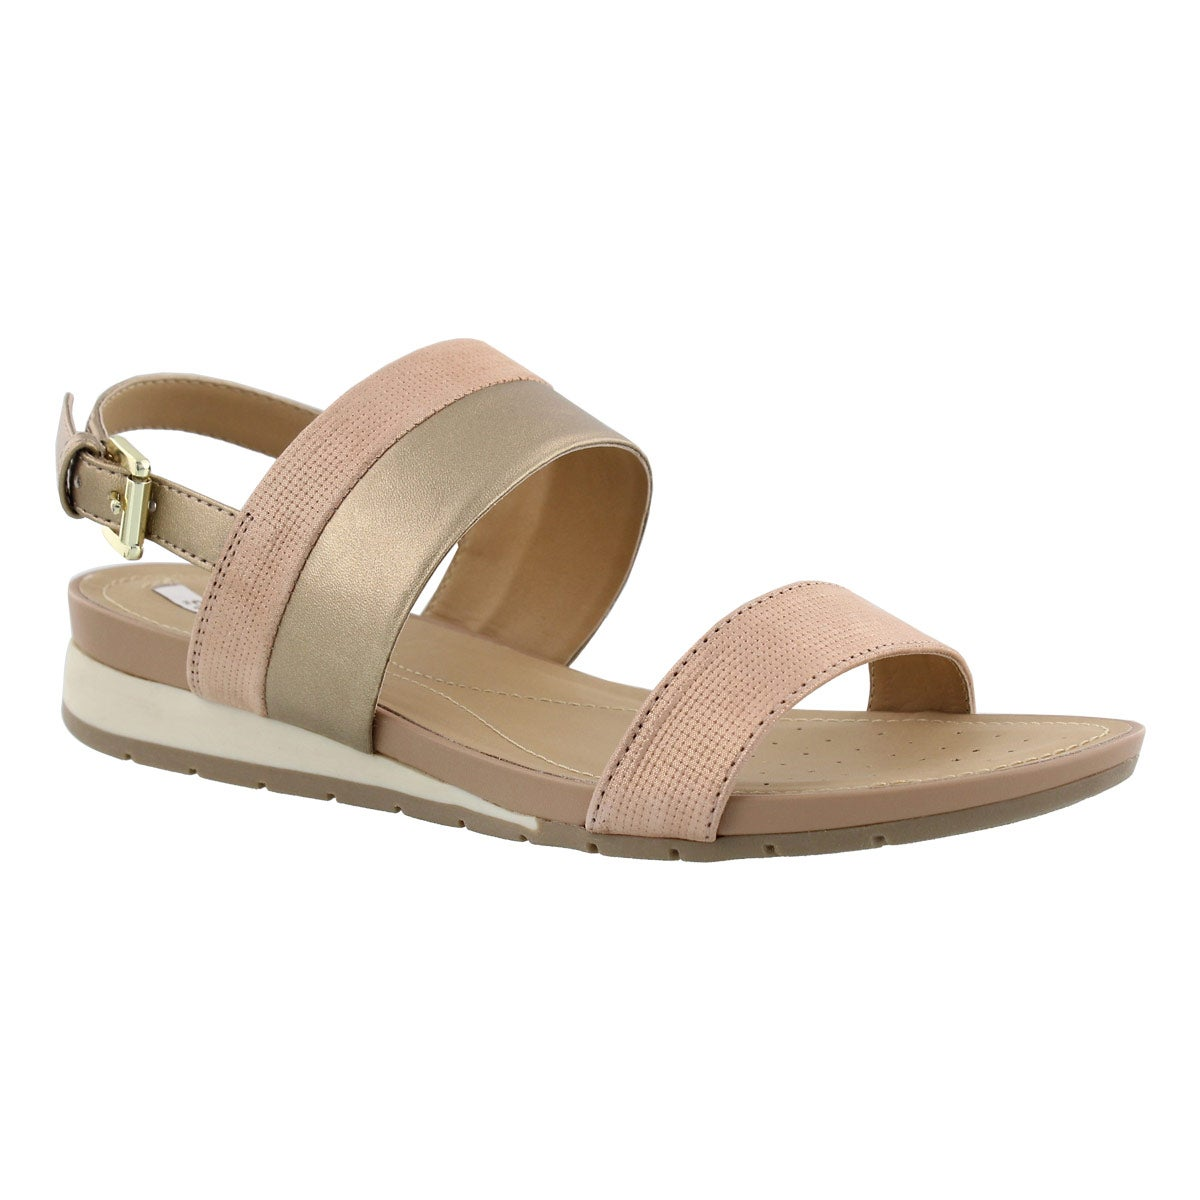 Women's FORMOSA rose gold wedge sandals